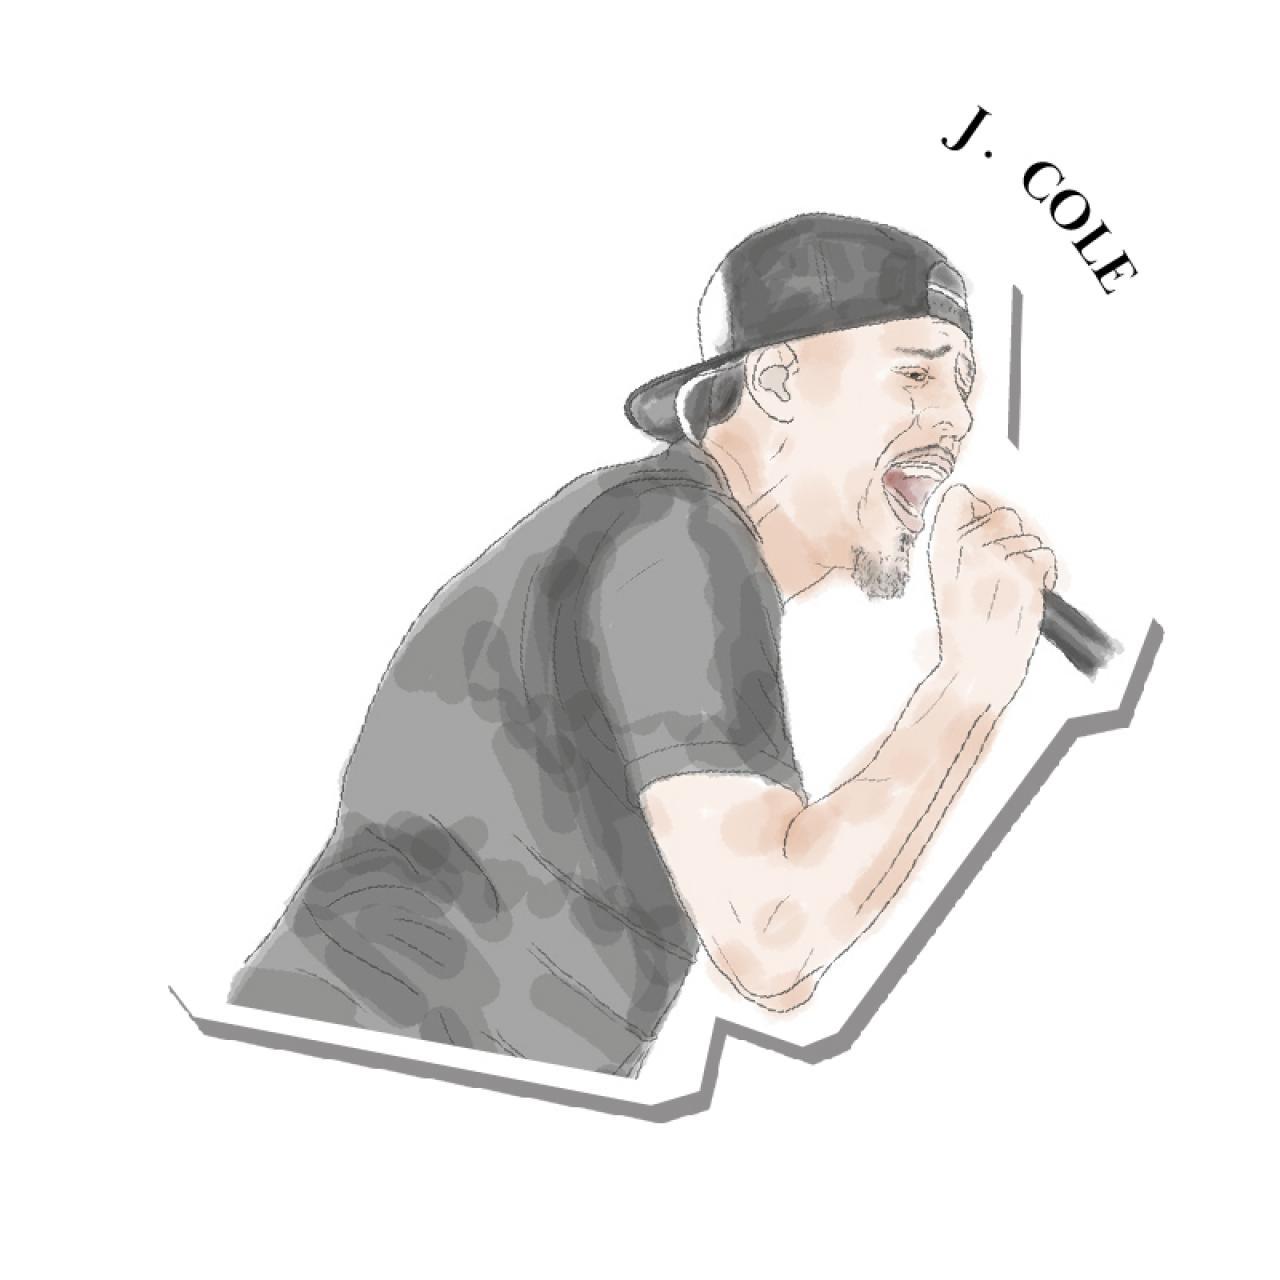 An illustration of J. Cole